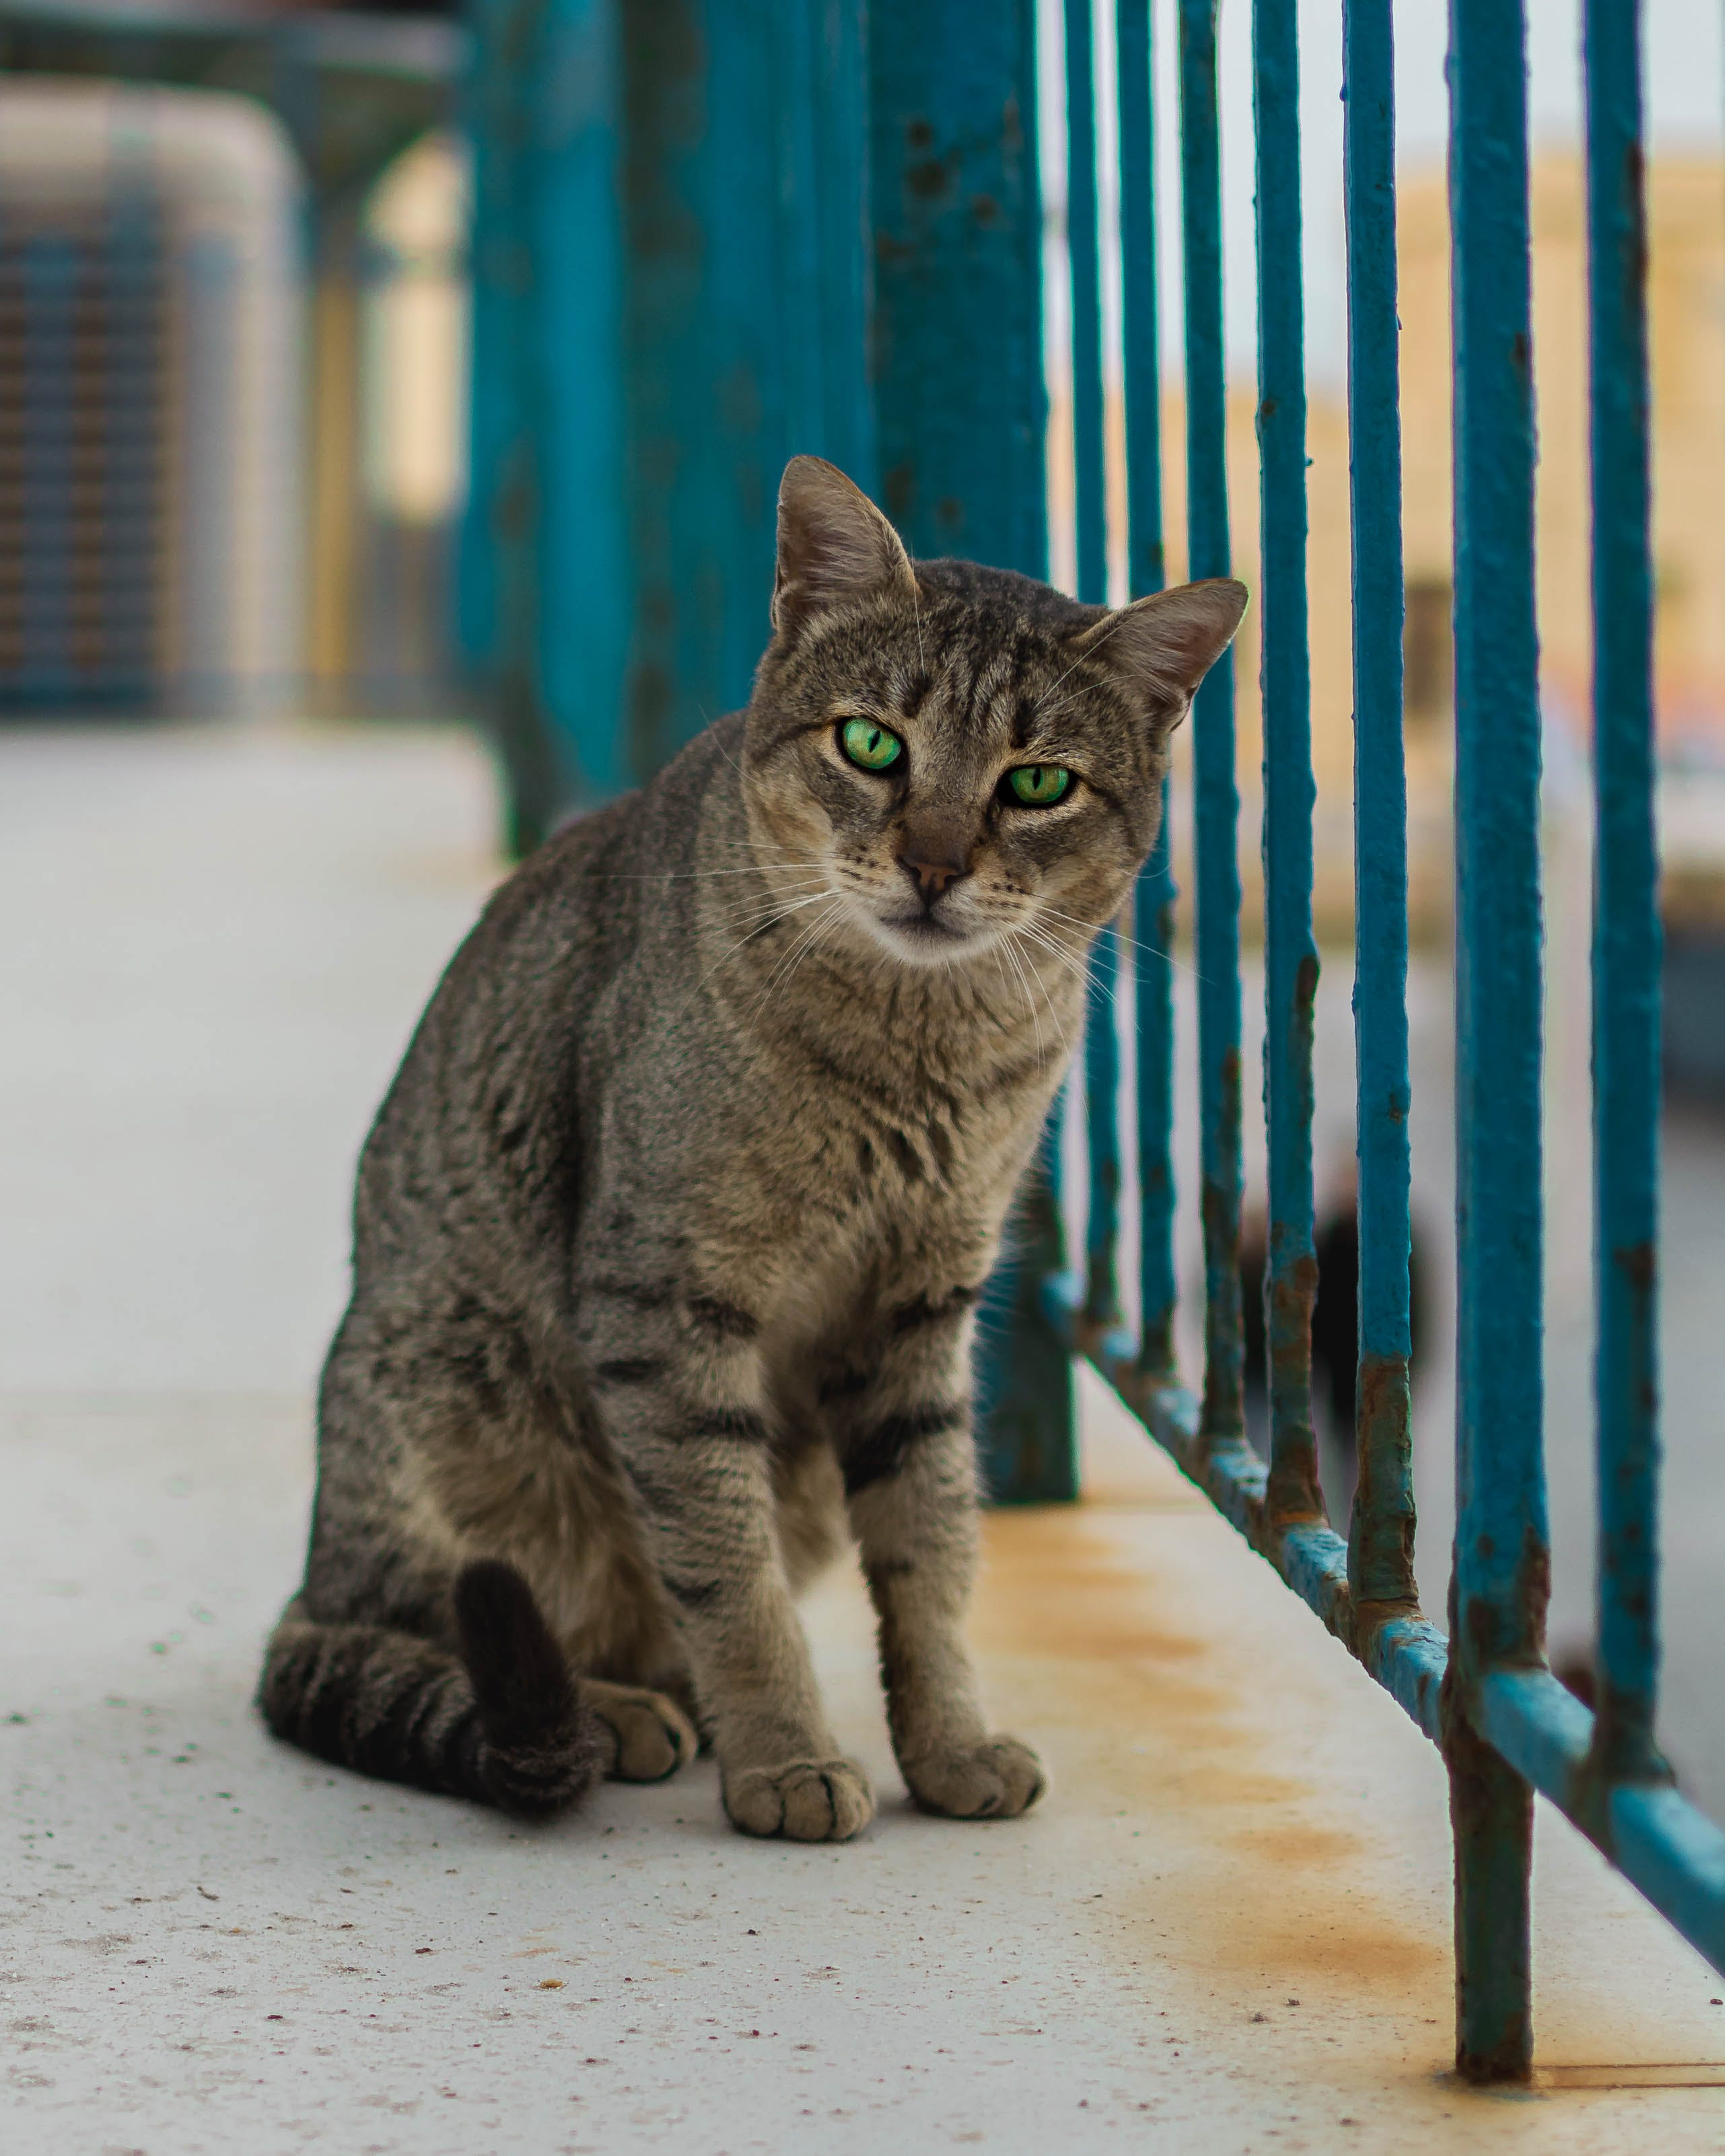 Free stock photo of animal, cat, cat's eyes, eyes